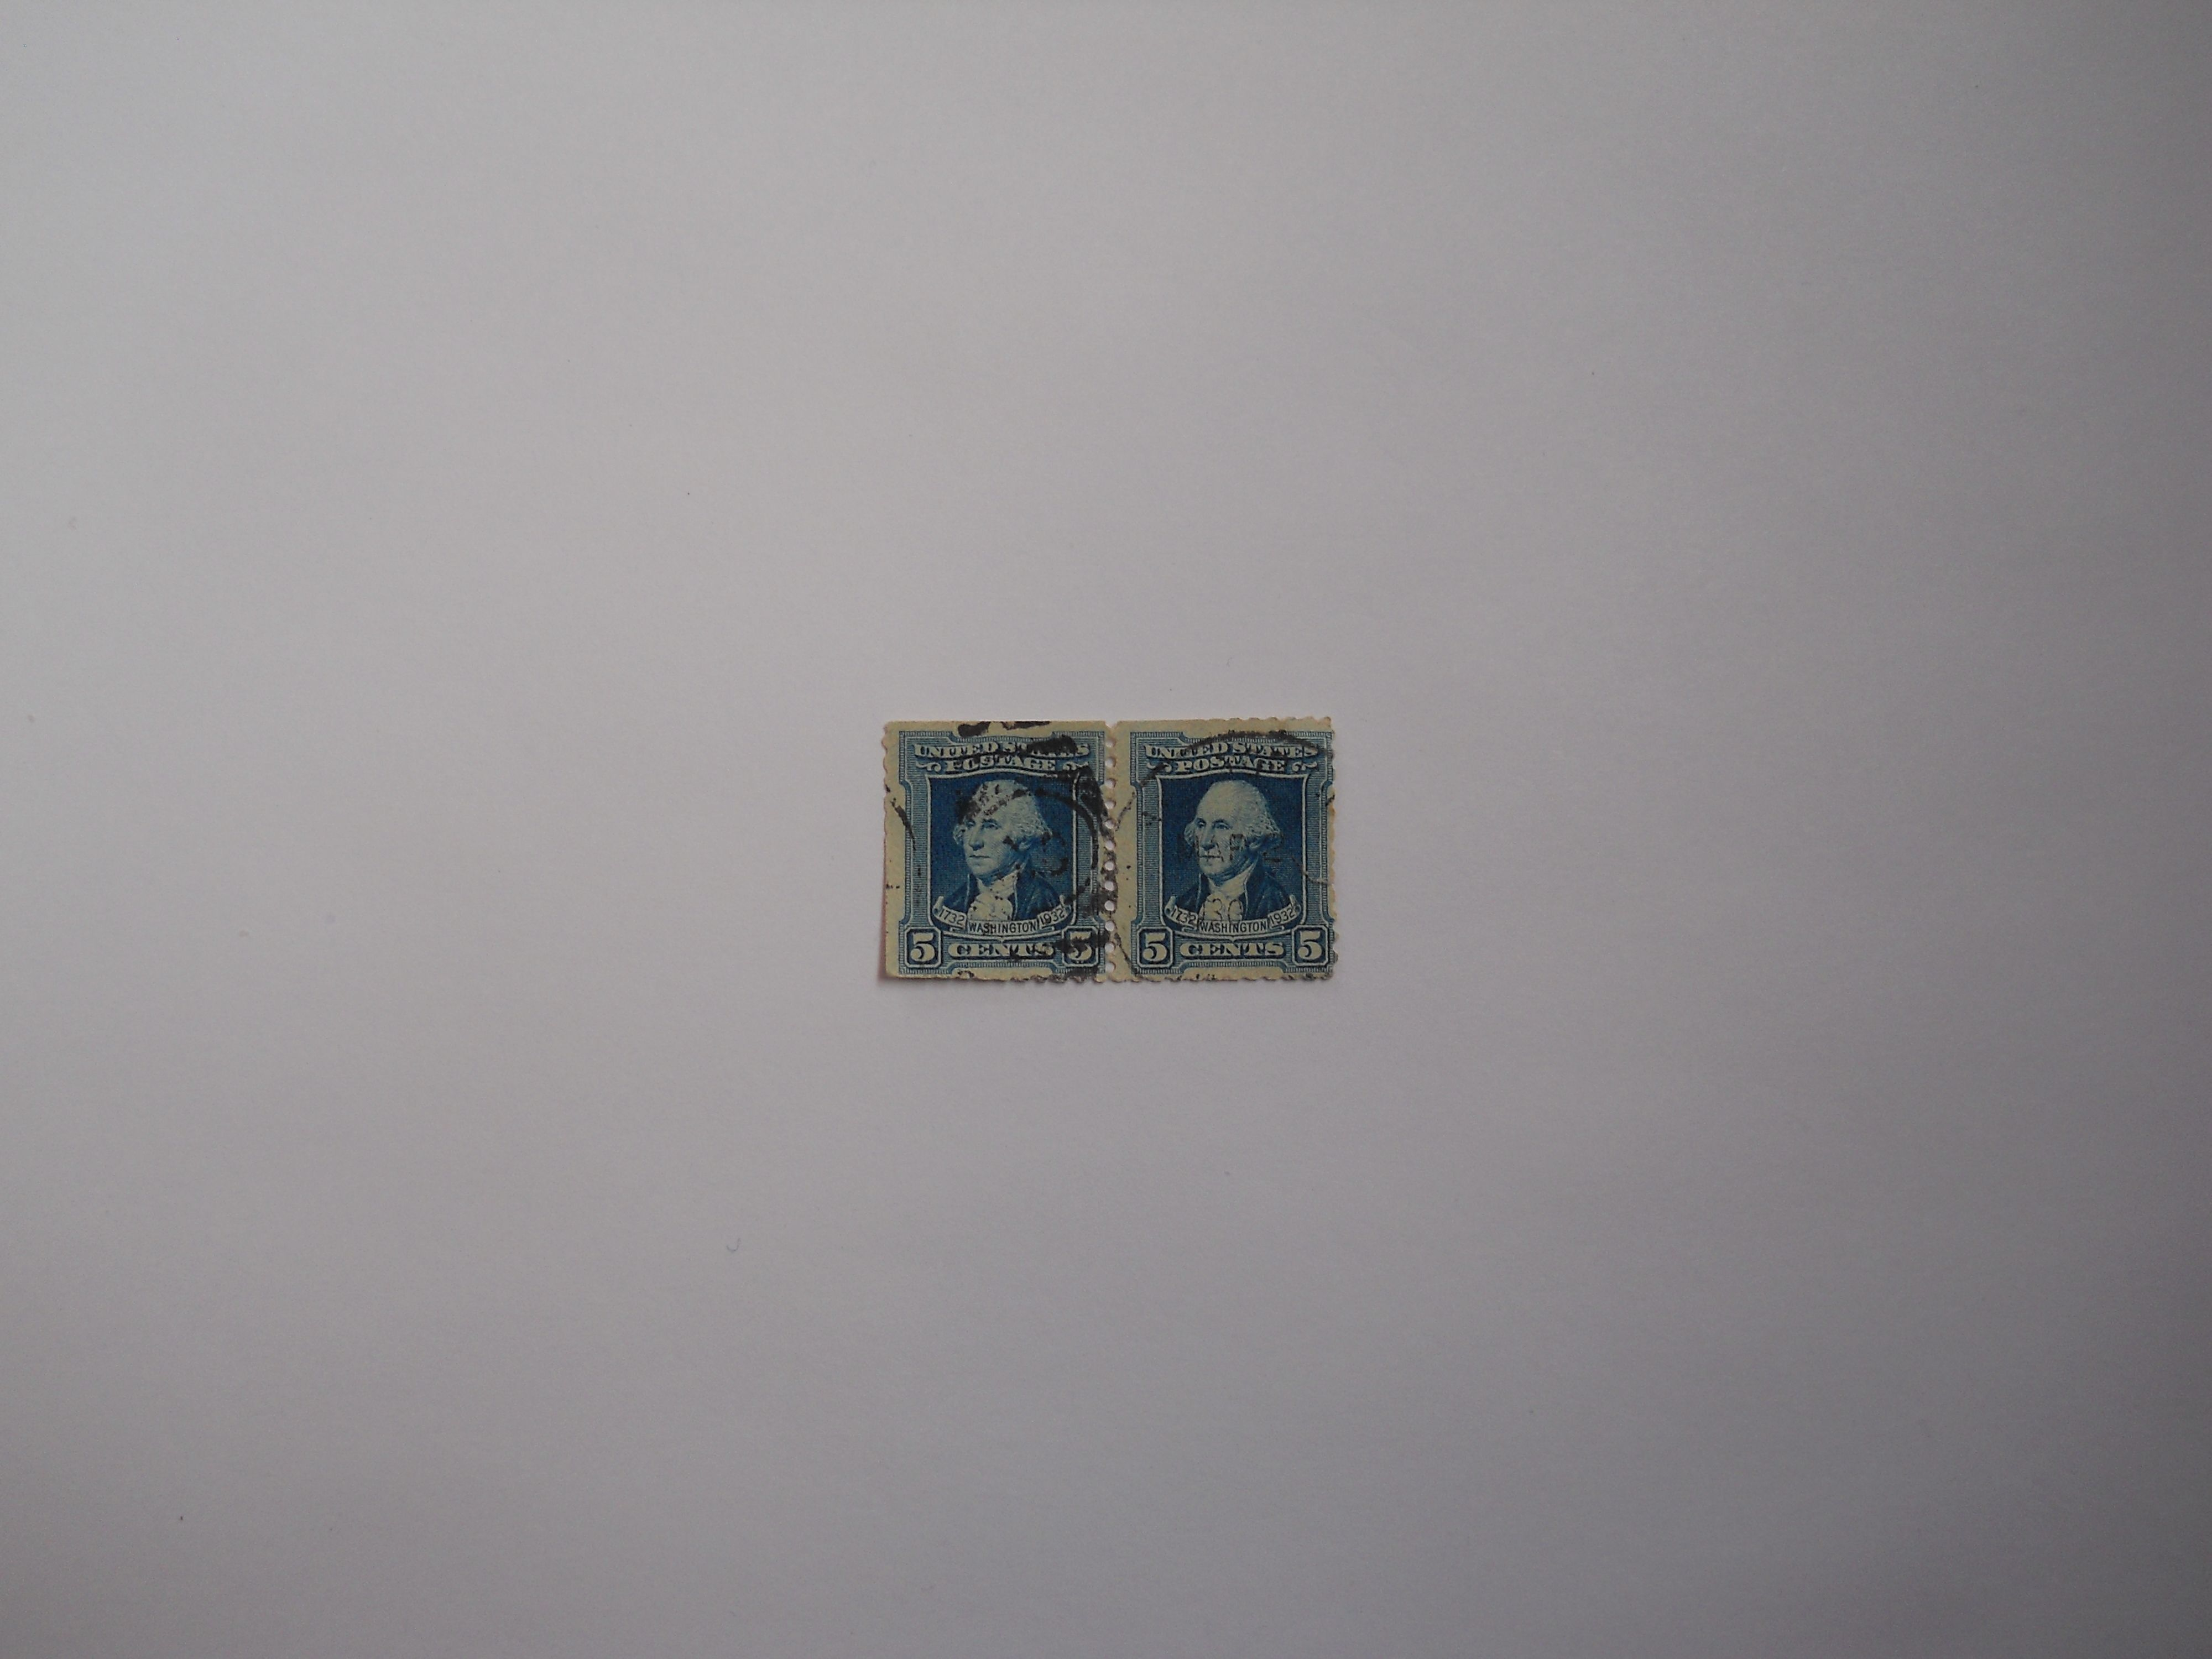 1732-1932 Blue Washington 5 Cents Postal Stamp